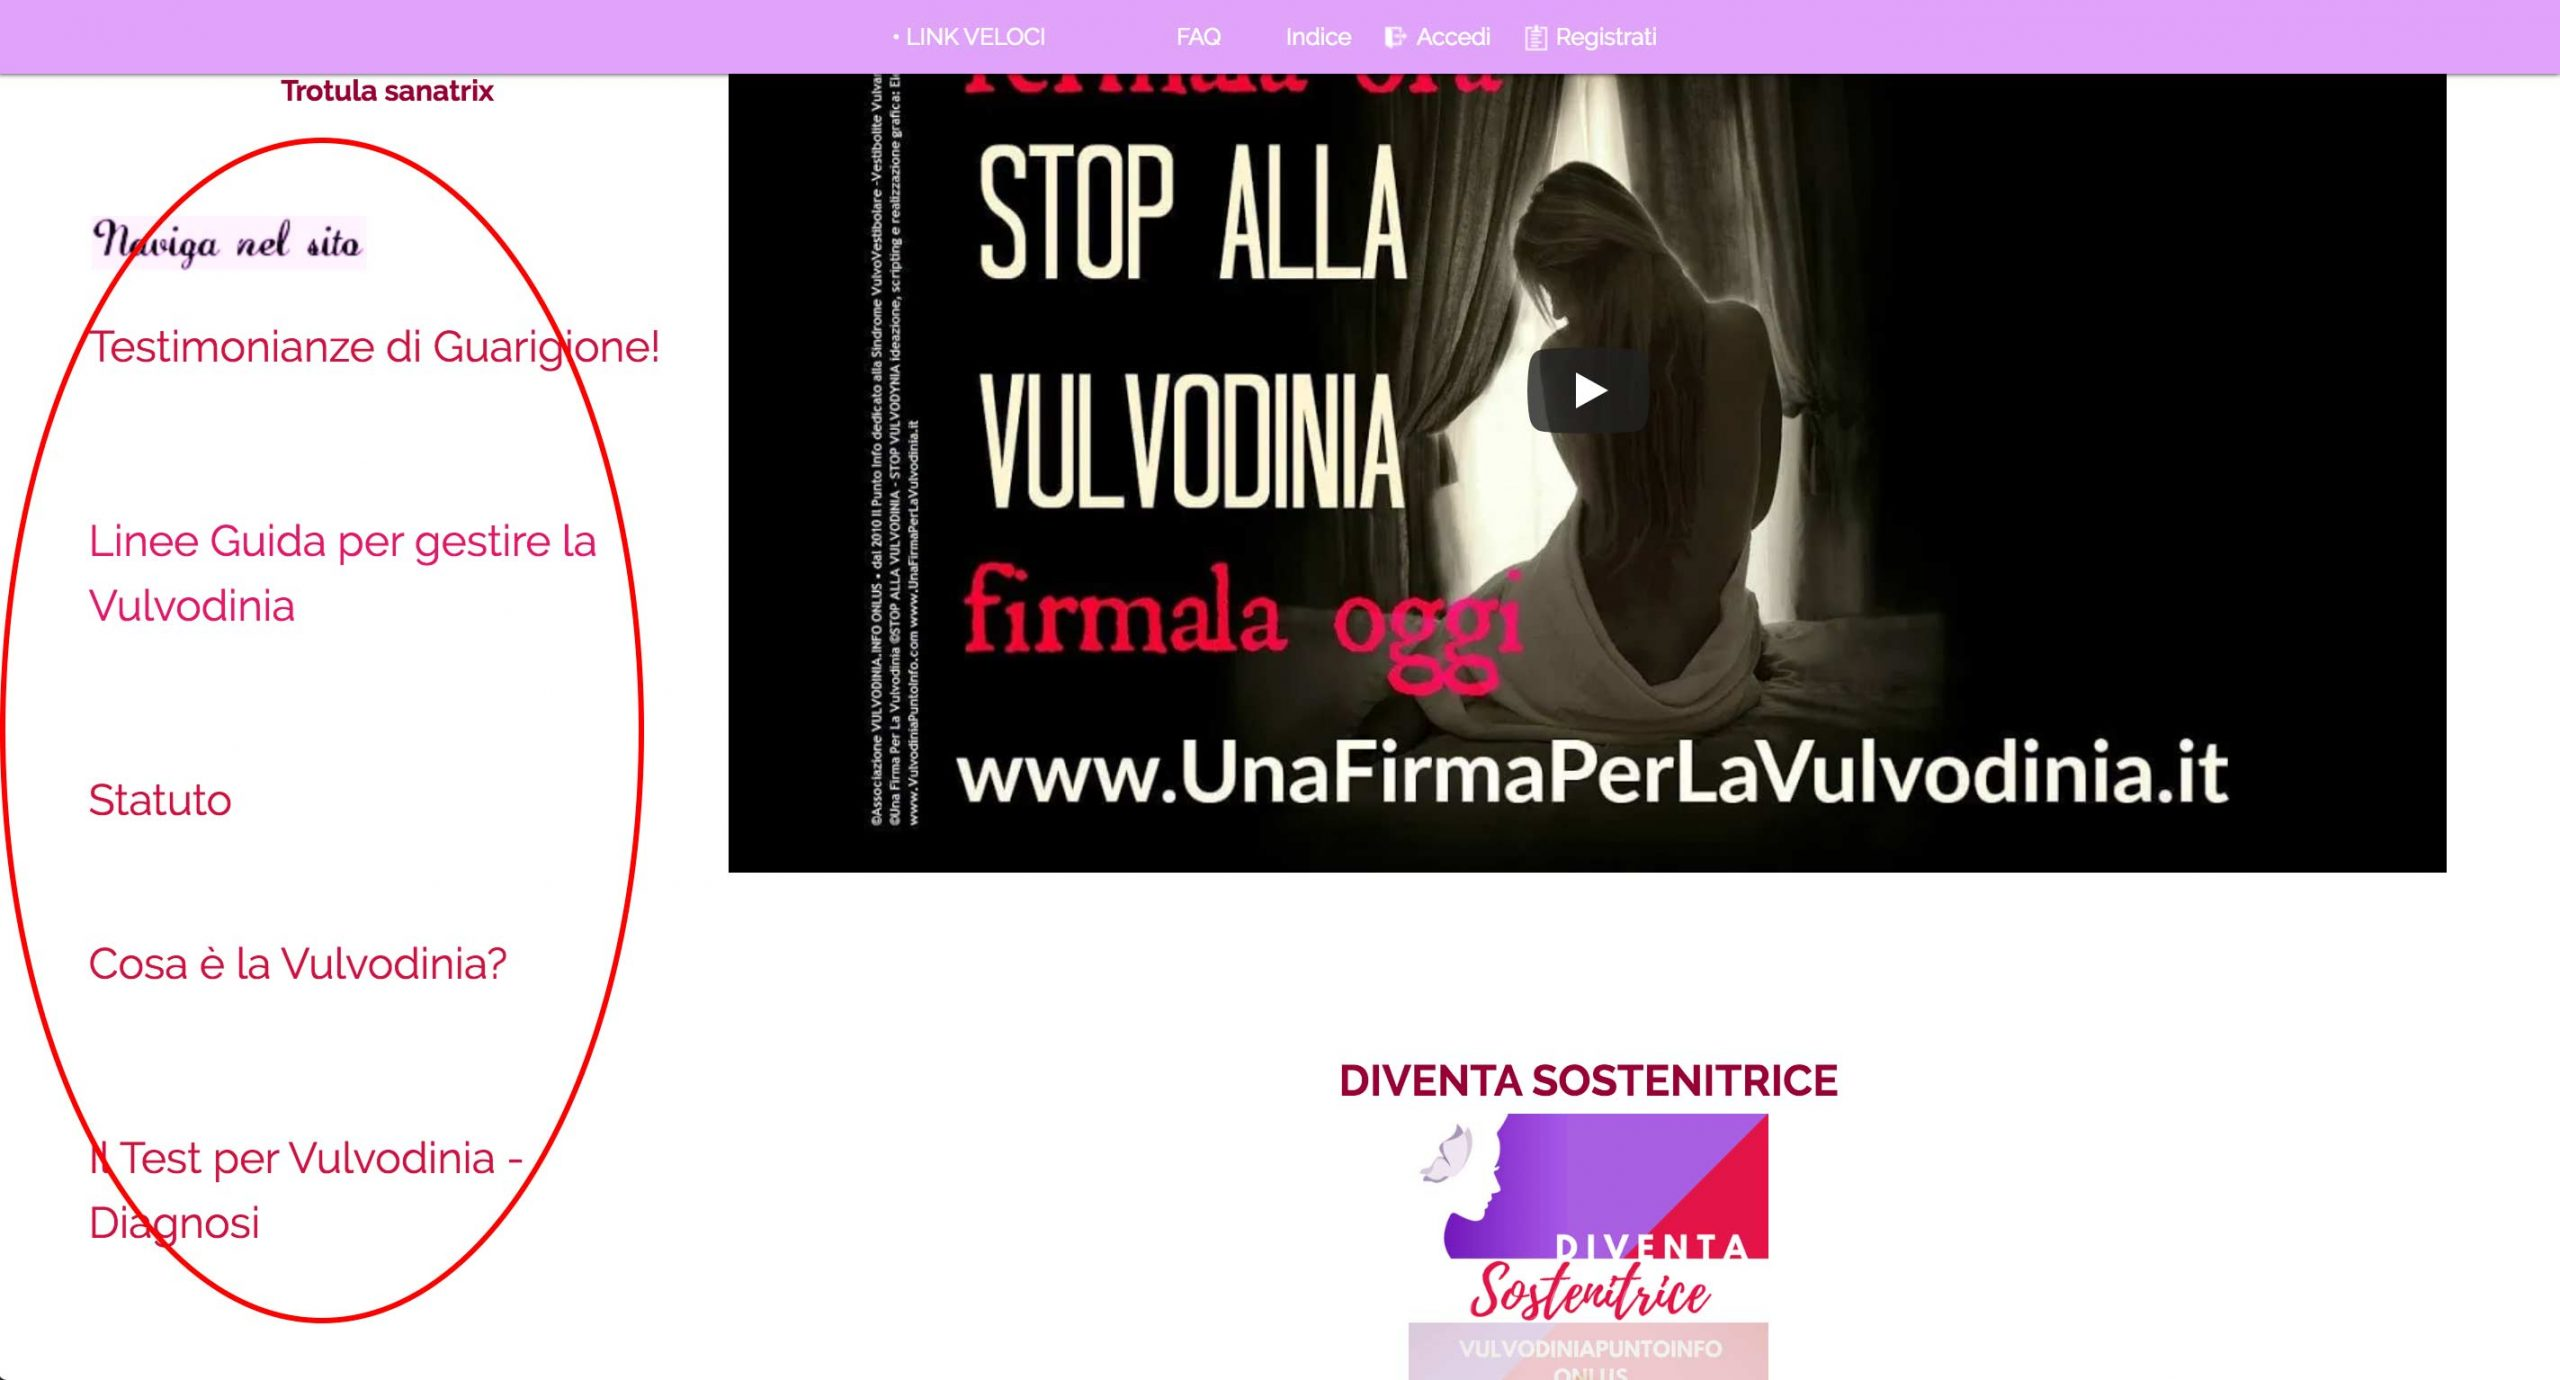 Vulvodinia Punto Info - Side navigation